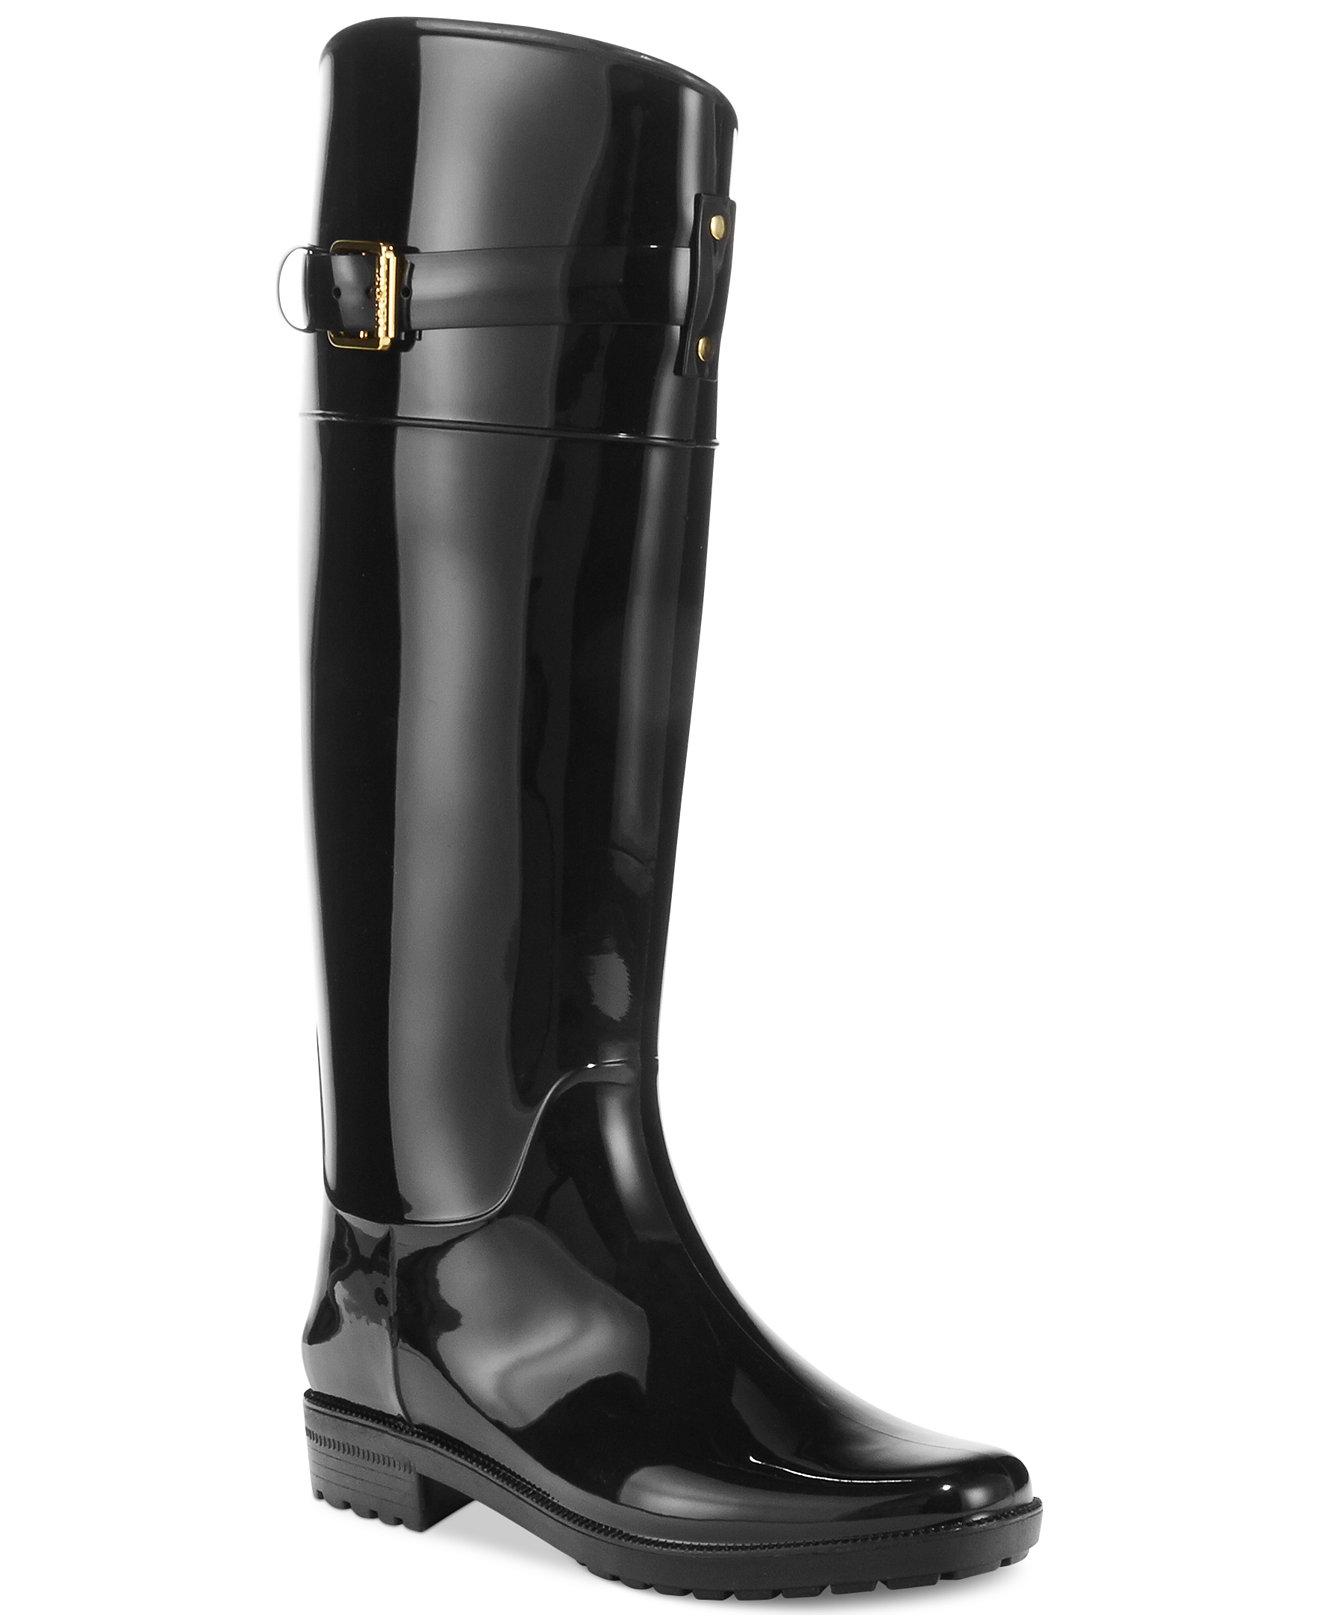 Cool Lauren Ralph Lauren Maritza Womens Leather Riding Boots Wide Calf